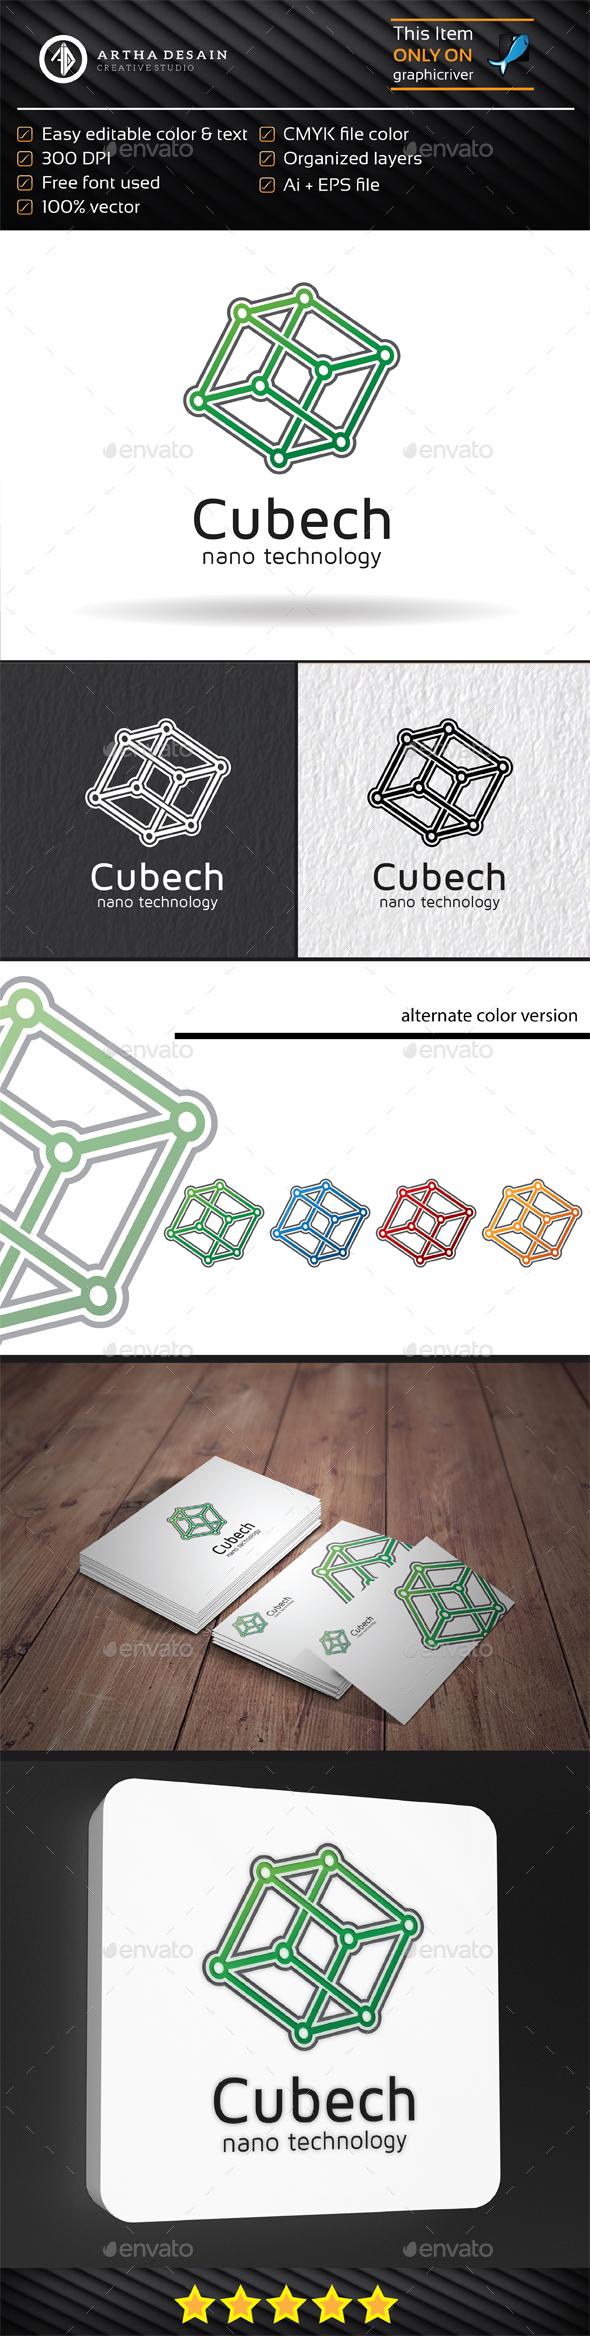 Cube Technology - Logo Template